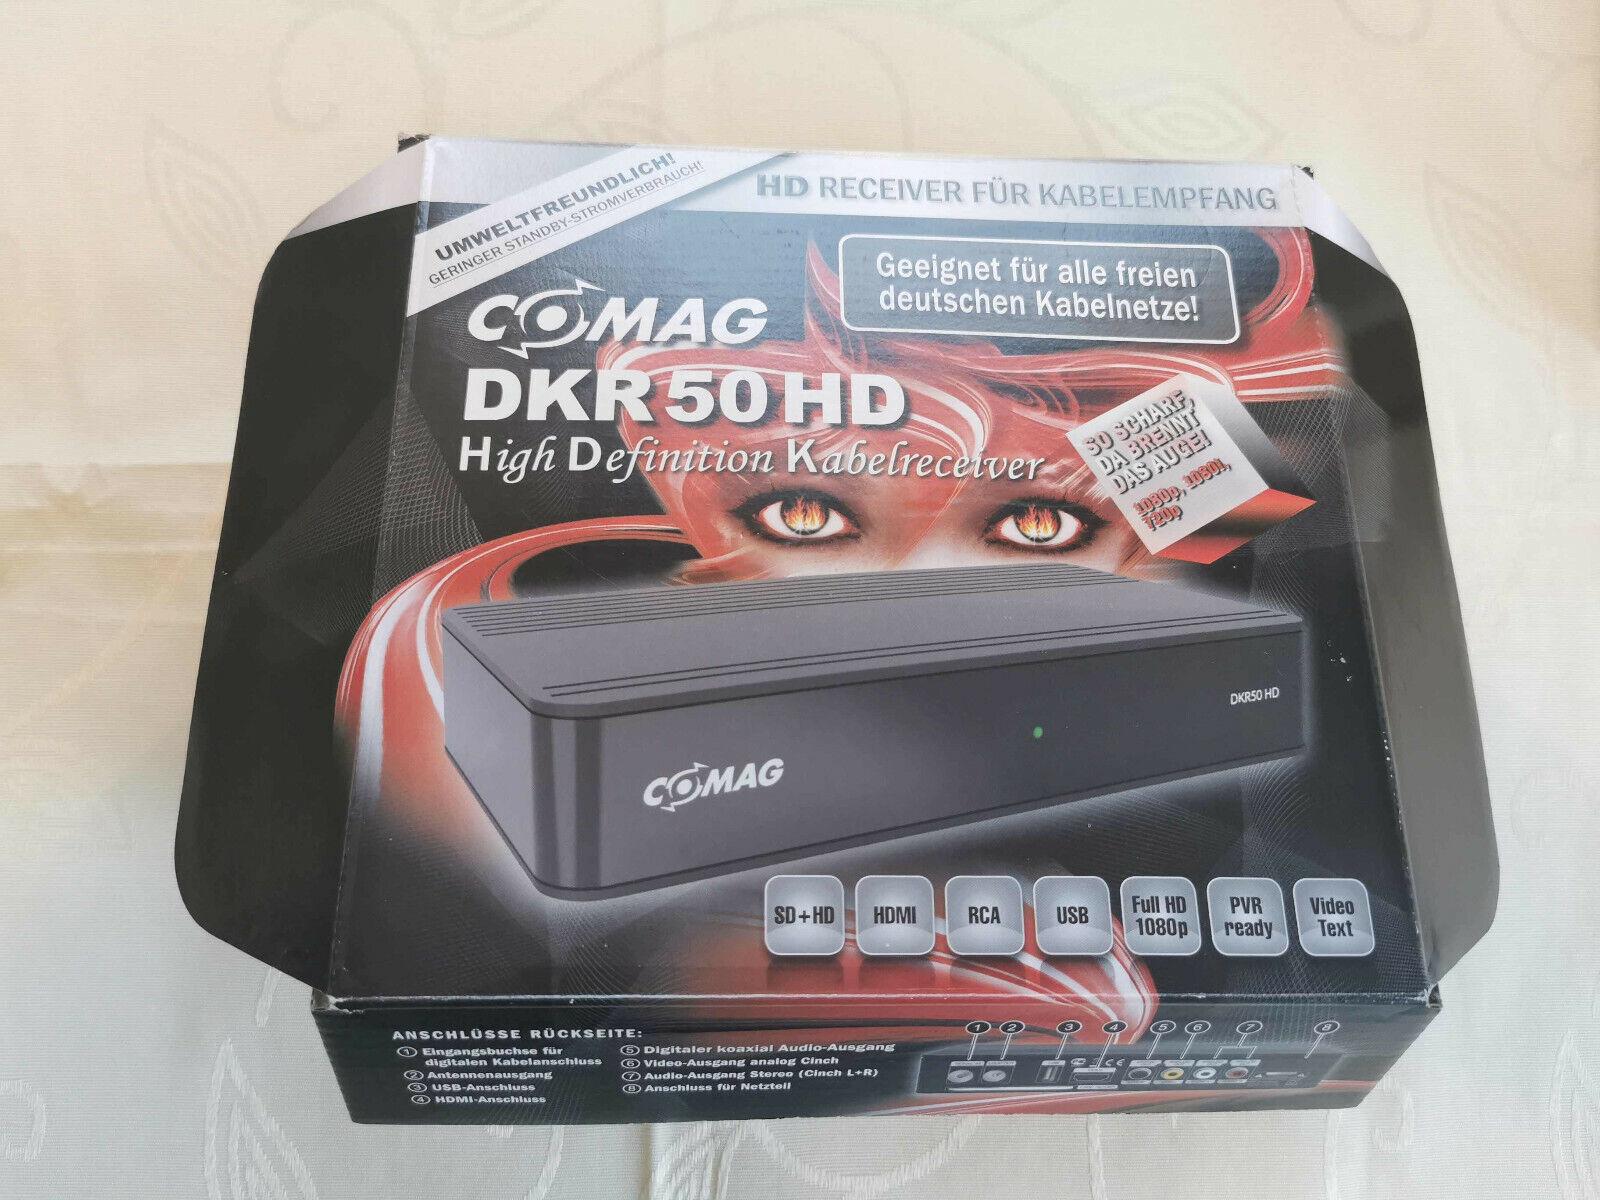 Comag DKR 50 Digital HD Kabelreceiver DVB-C USB PVR HDMI Kabel Audio Cinch, NEU/